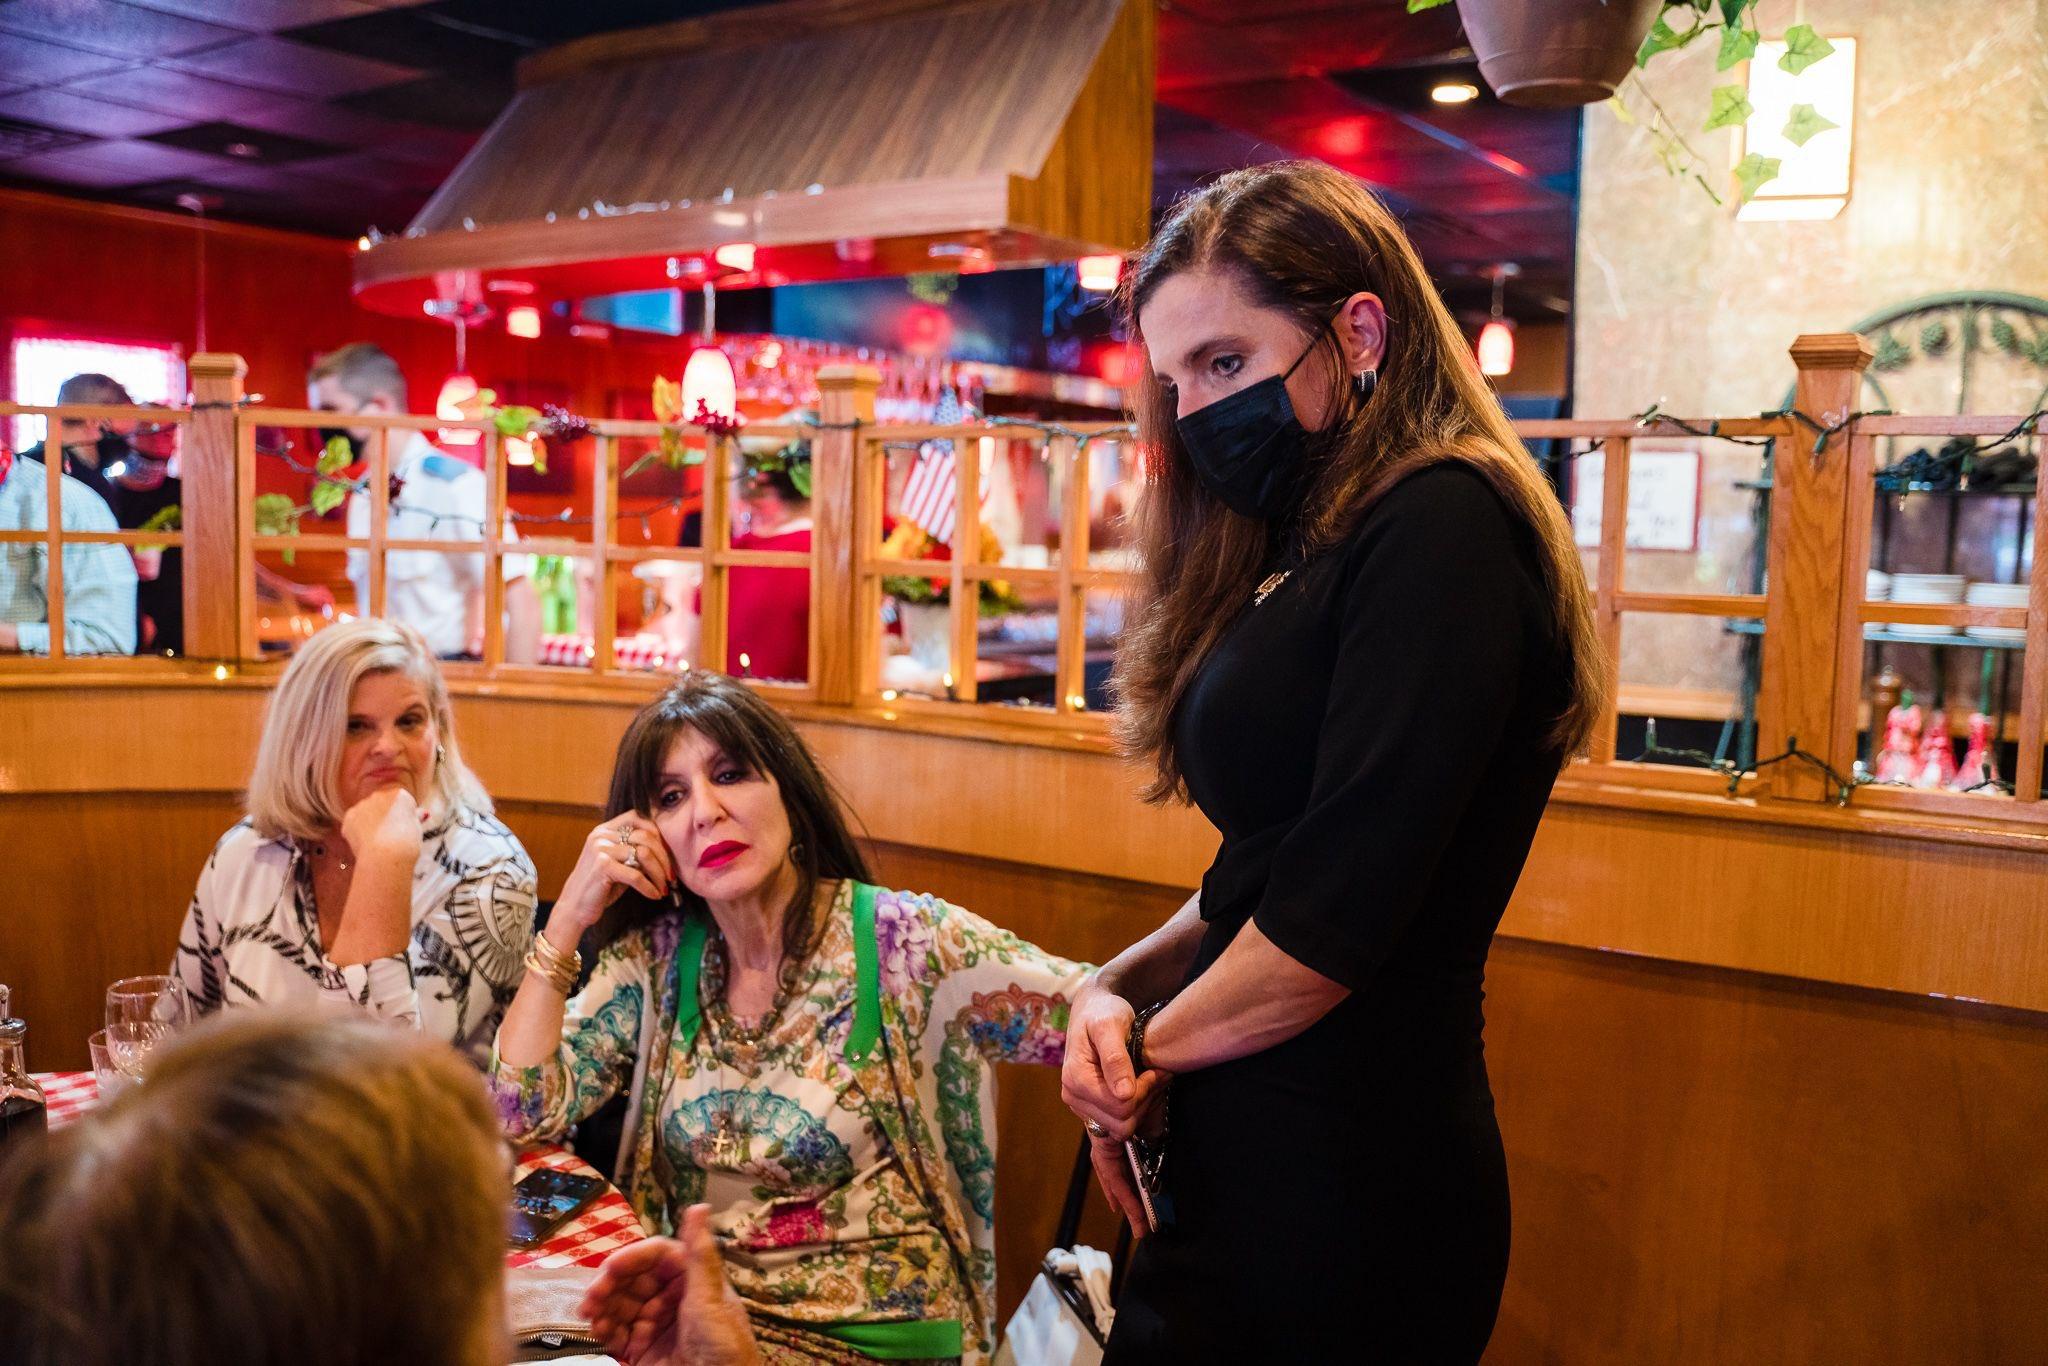 FITSNews – Nancy Mace Has Huge Fundraising Quarter, Enjoys Cash Advantage Over Joe Cunningham